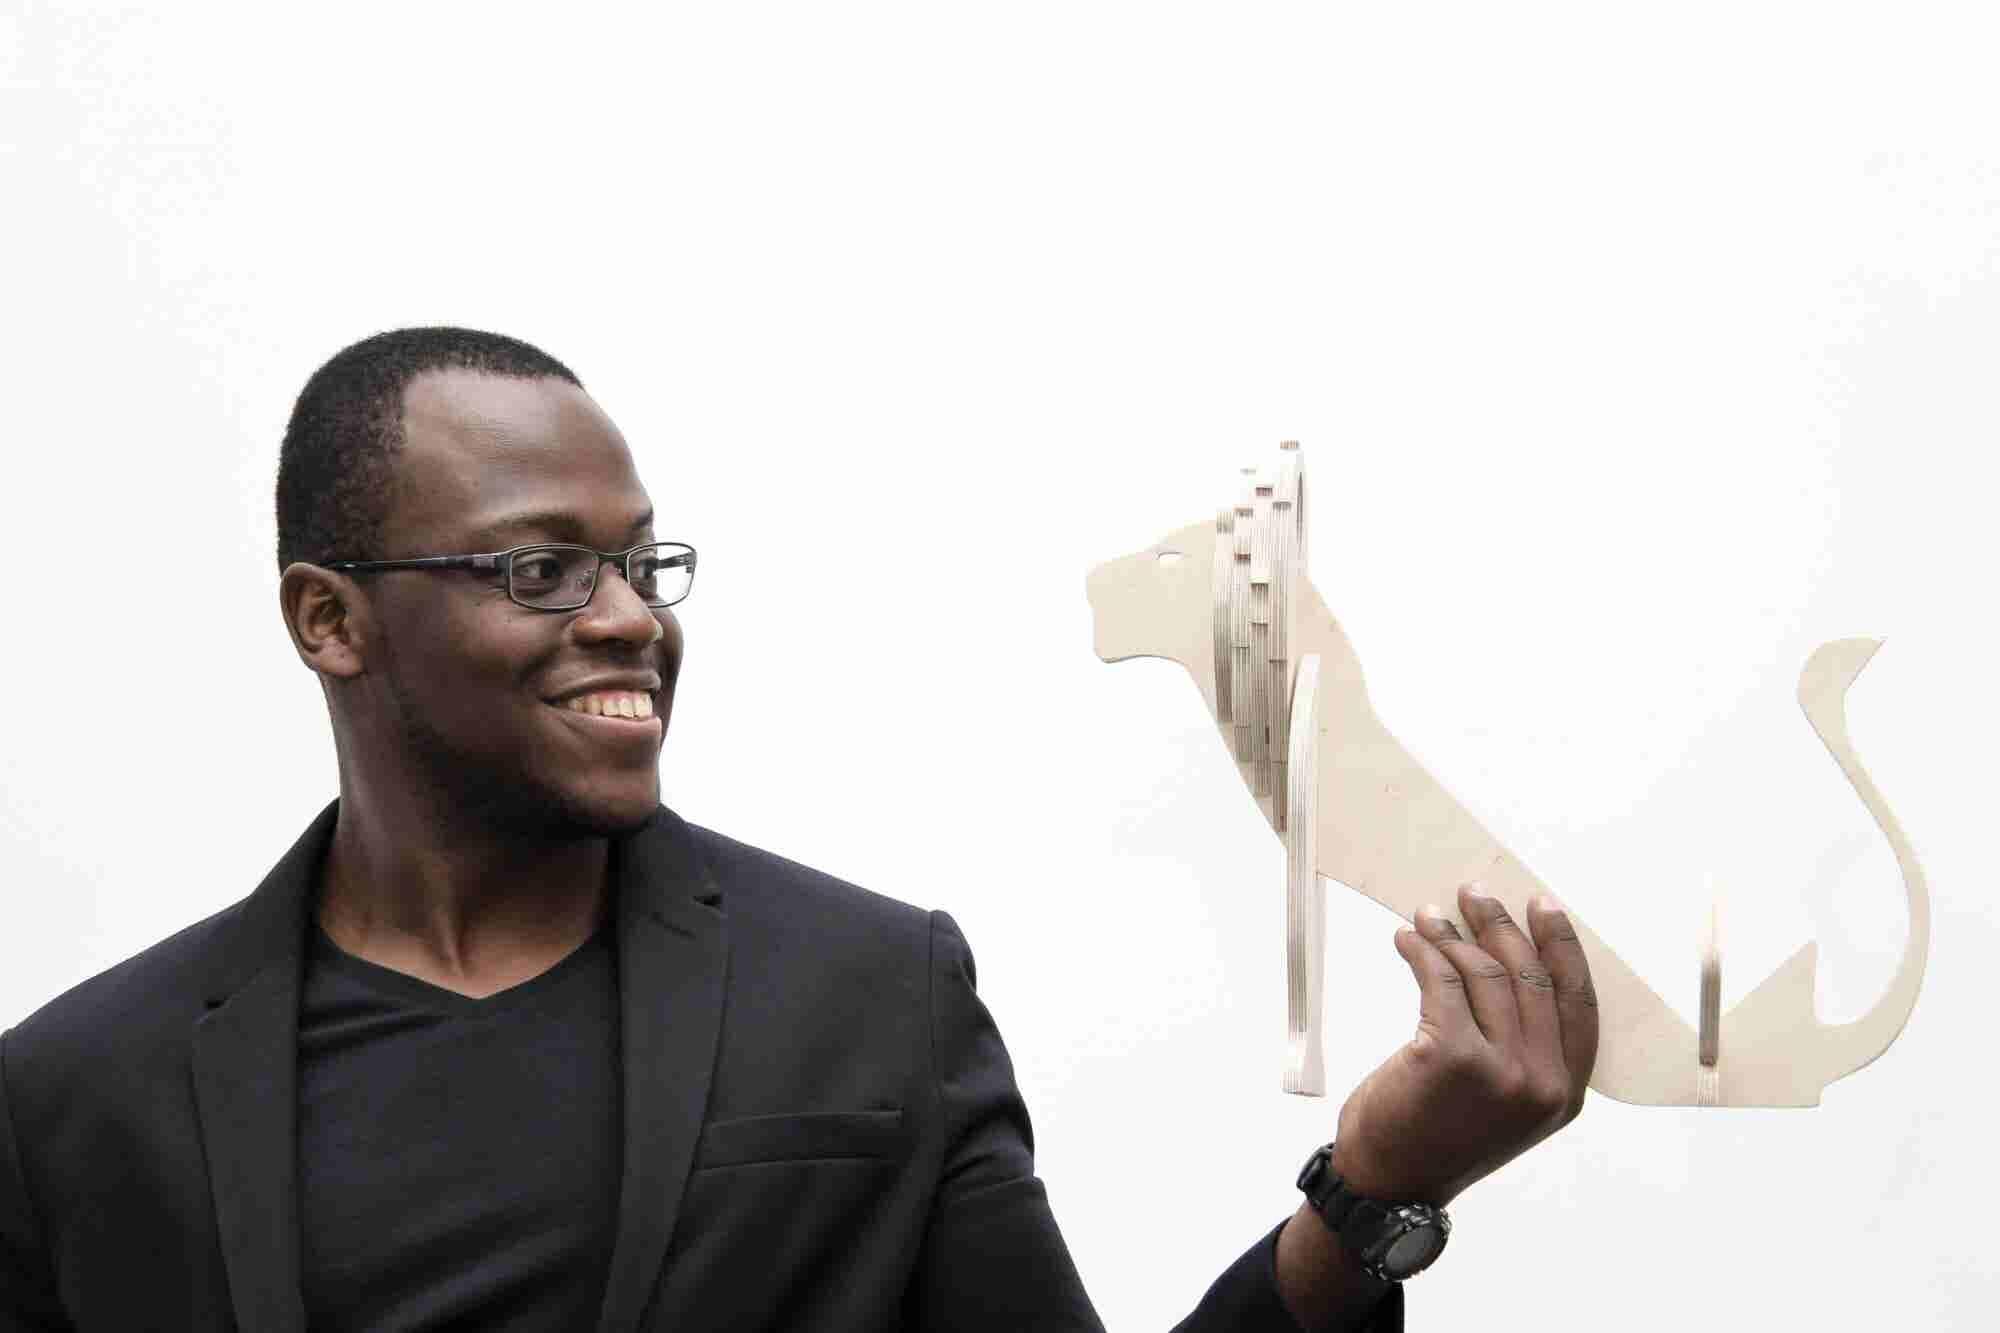 Shark Tank Winner Vusani Ravele on Why it's Not About the Money